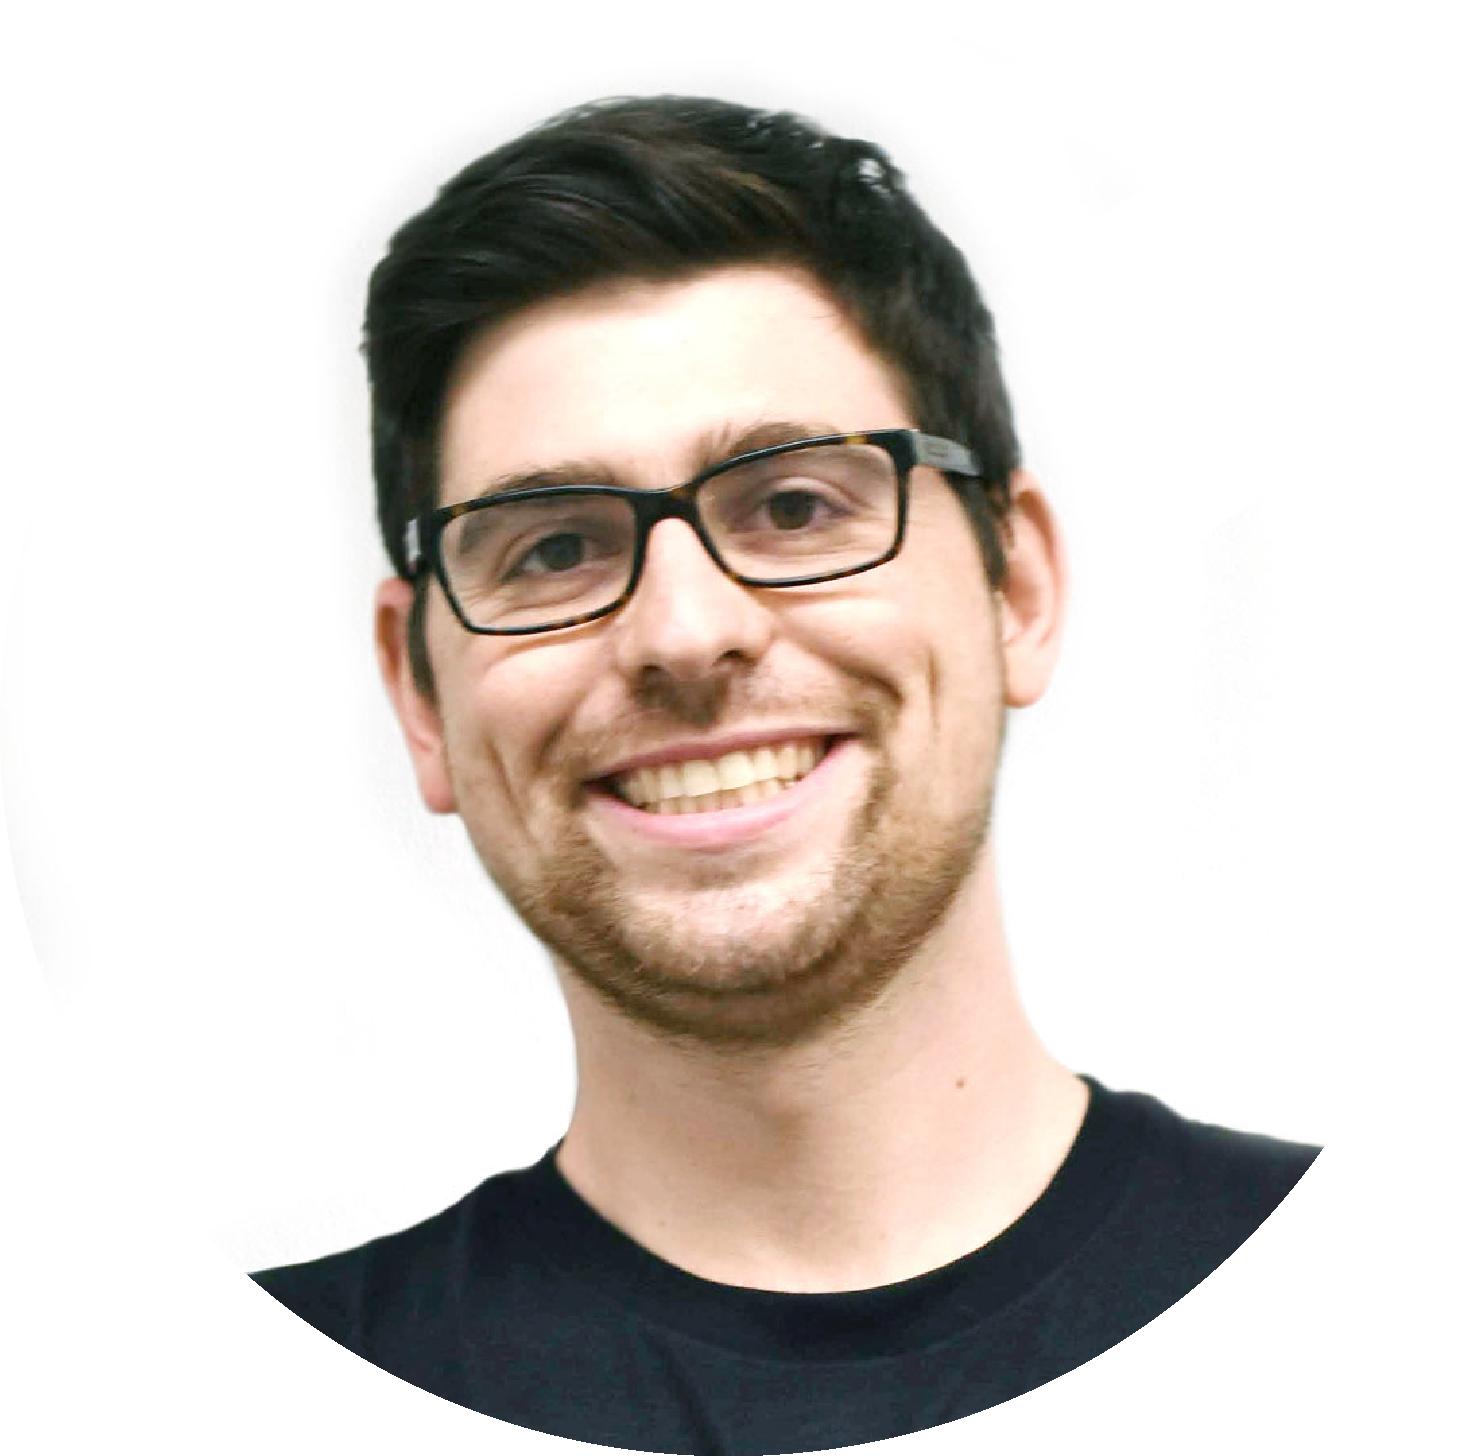 Photo of Tyler, a Prodigy online math tutor